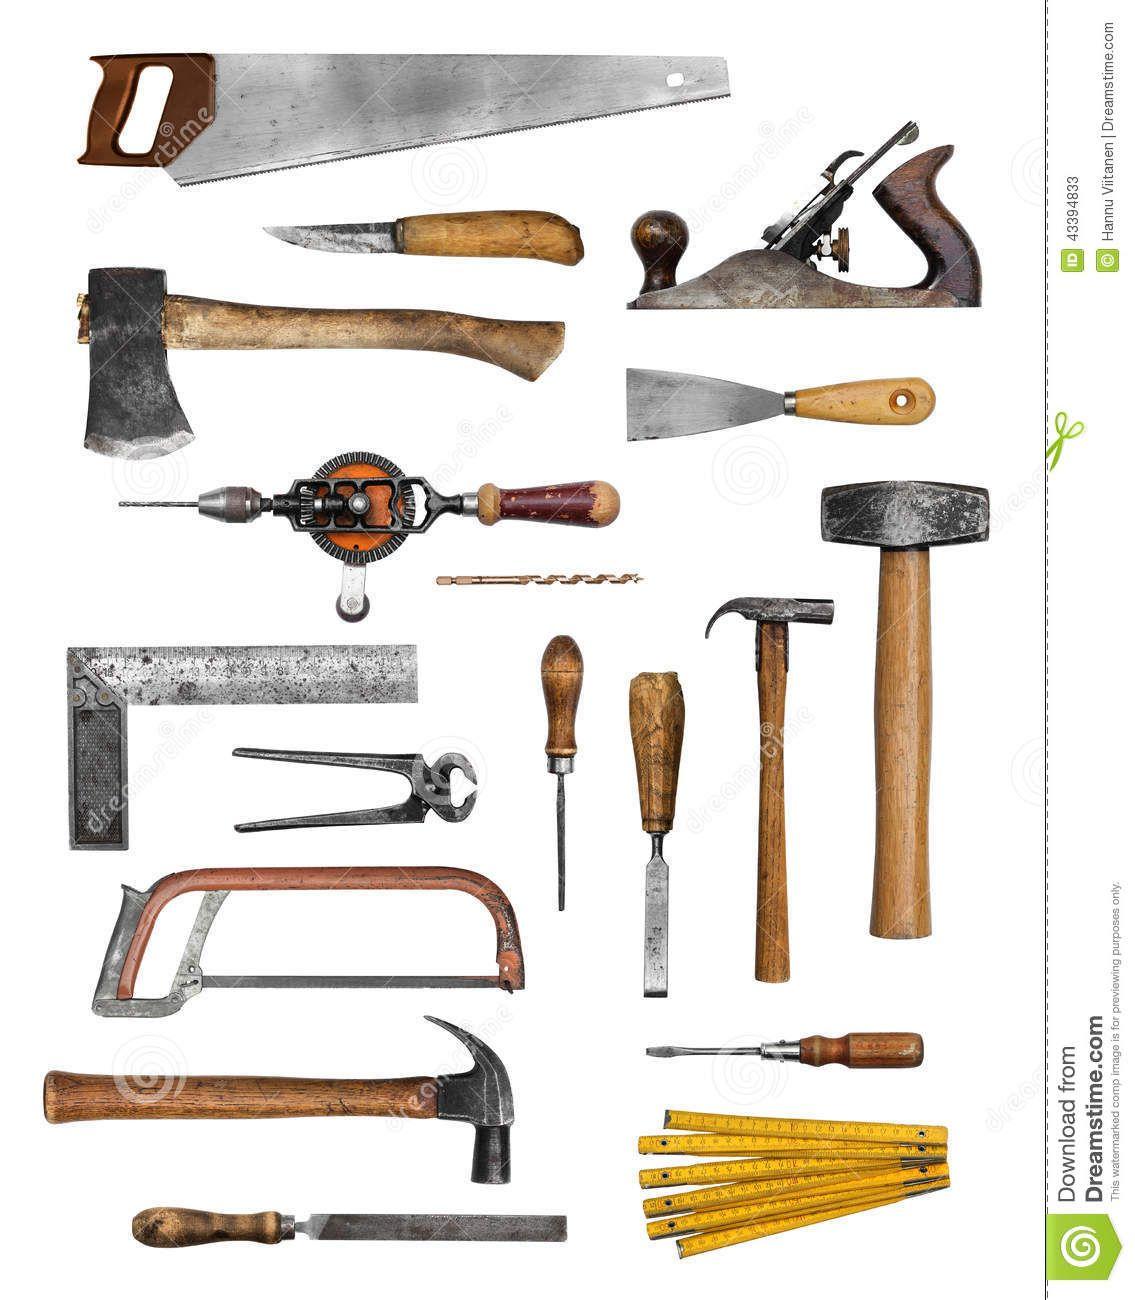 Pin On Carpenter Tools